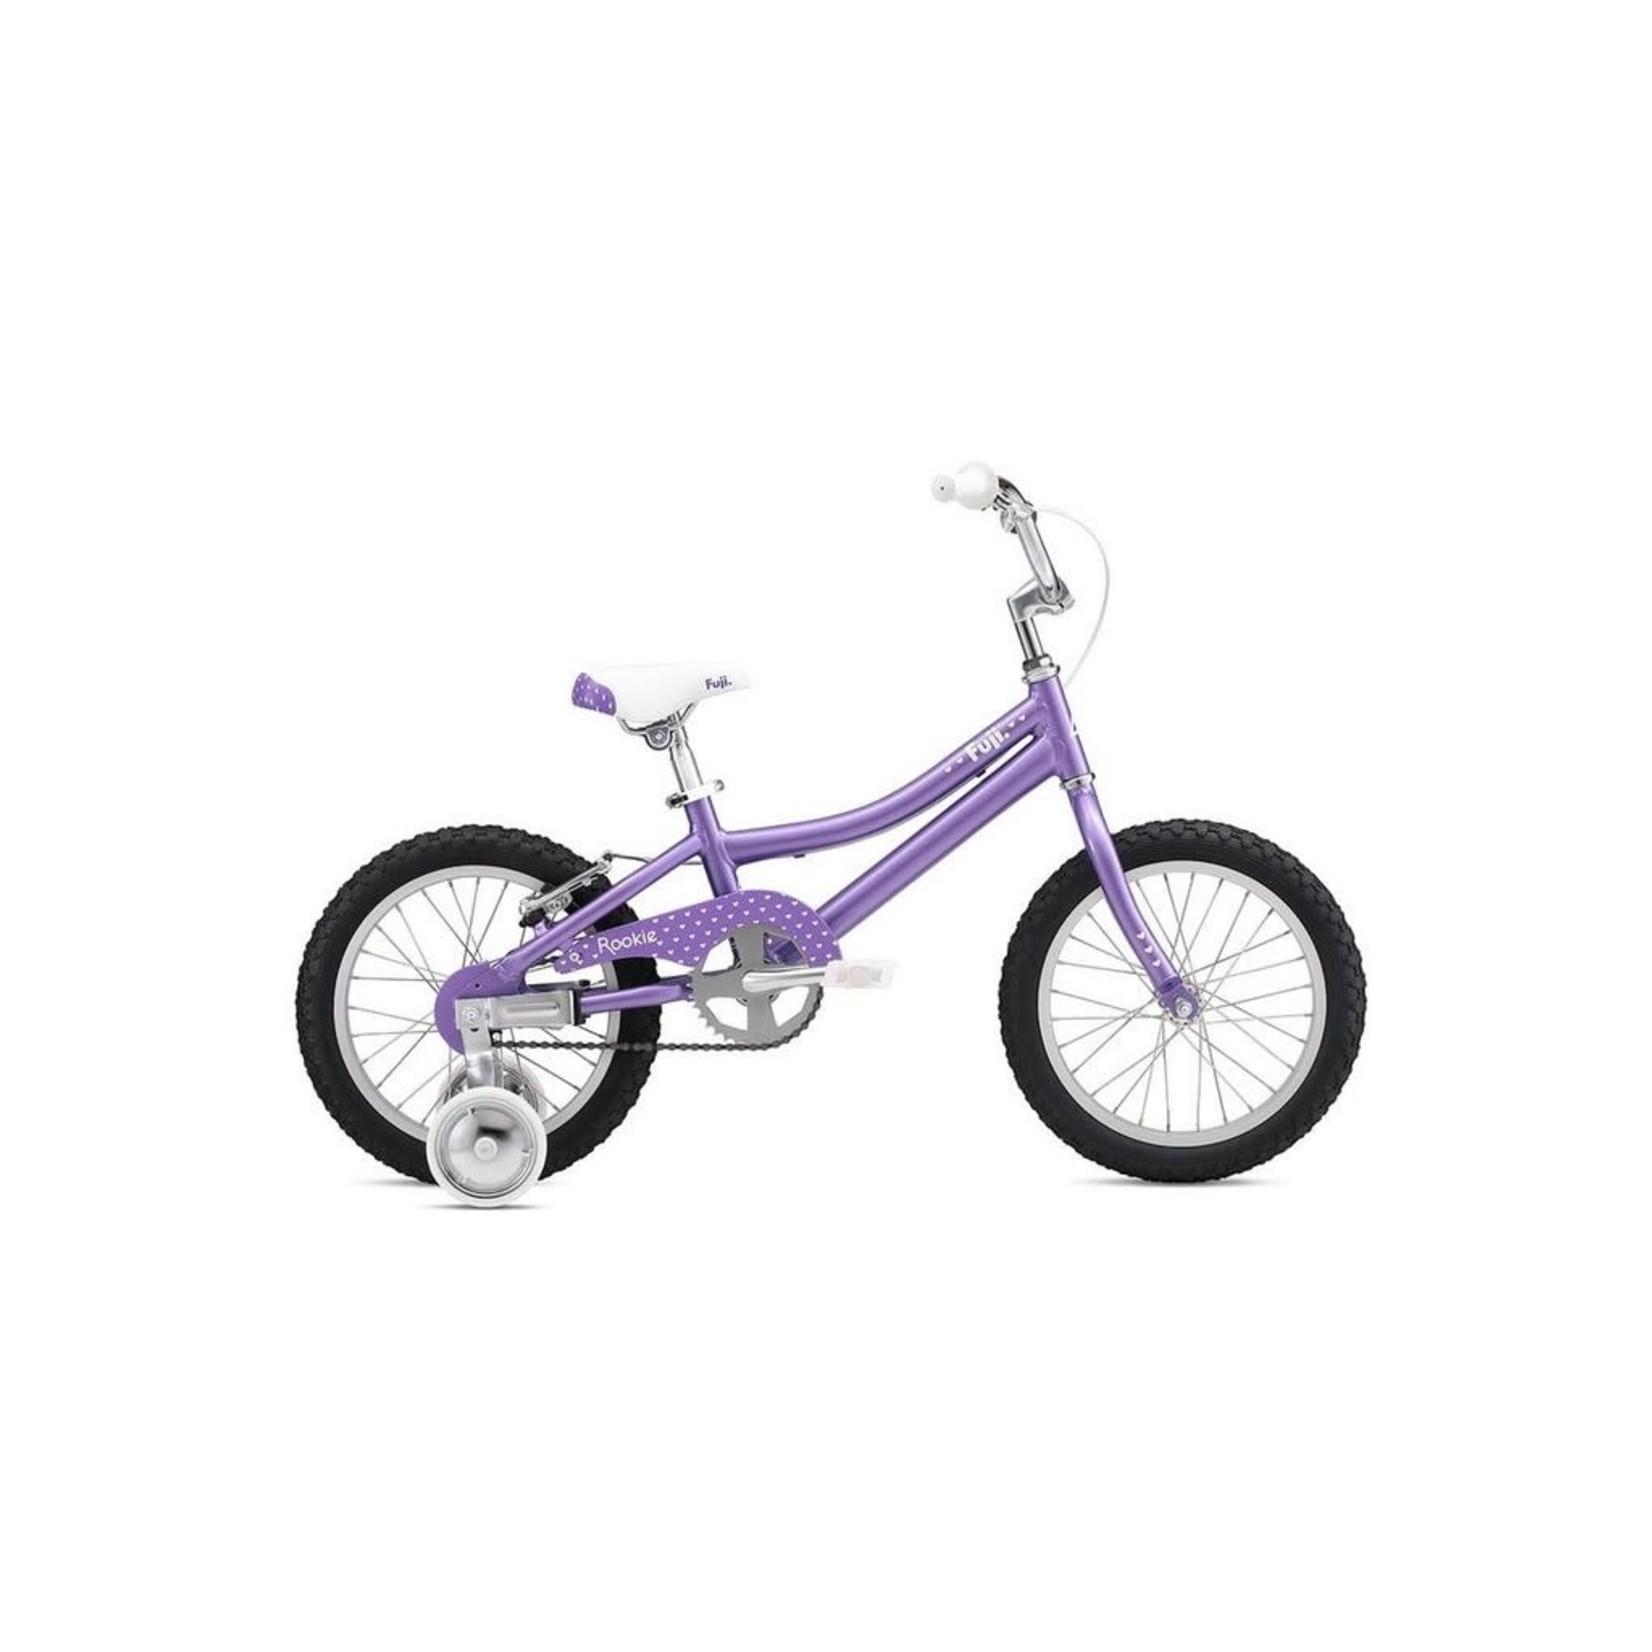 Fuji Bike Fuji Rookie Girl Violet 16